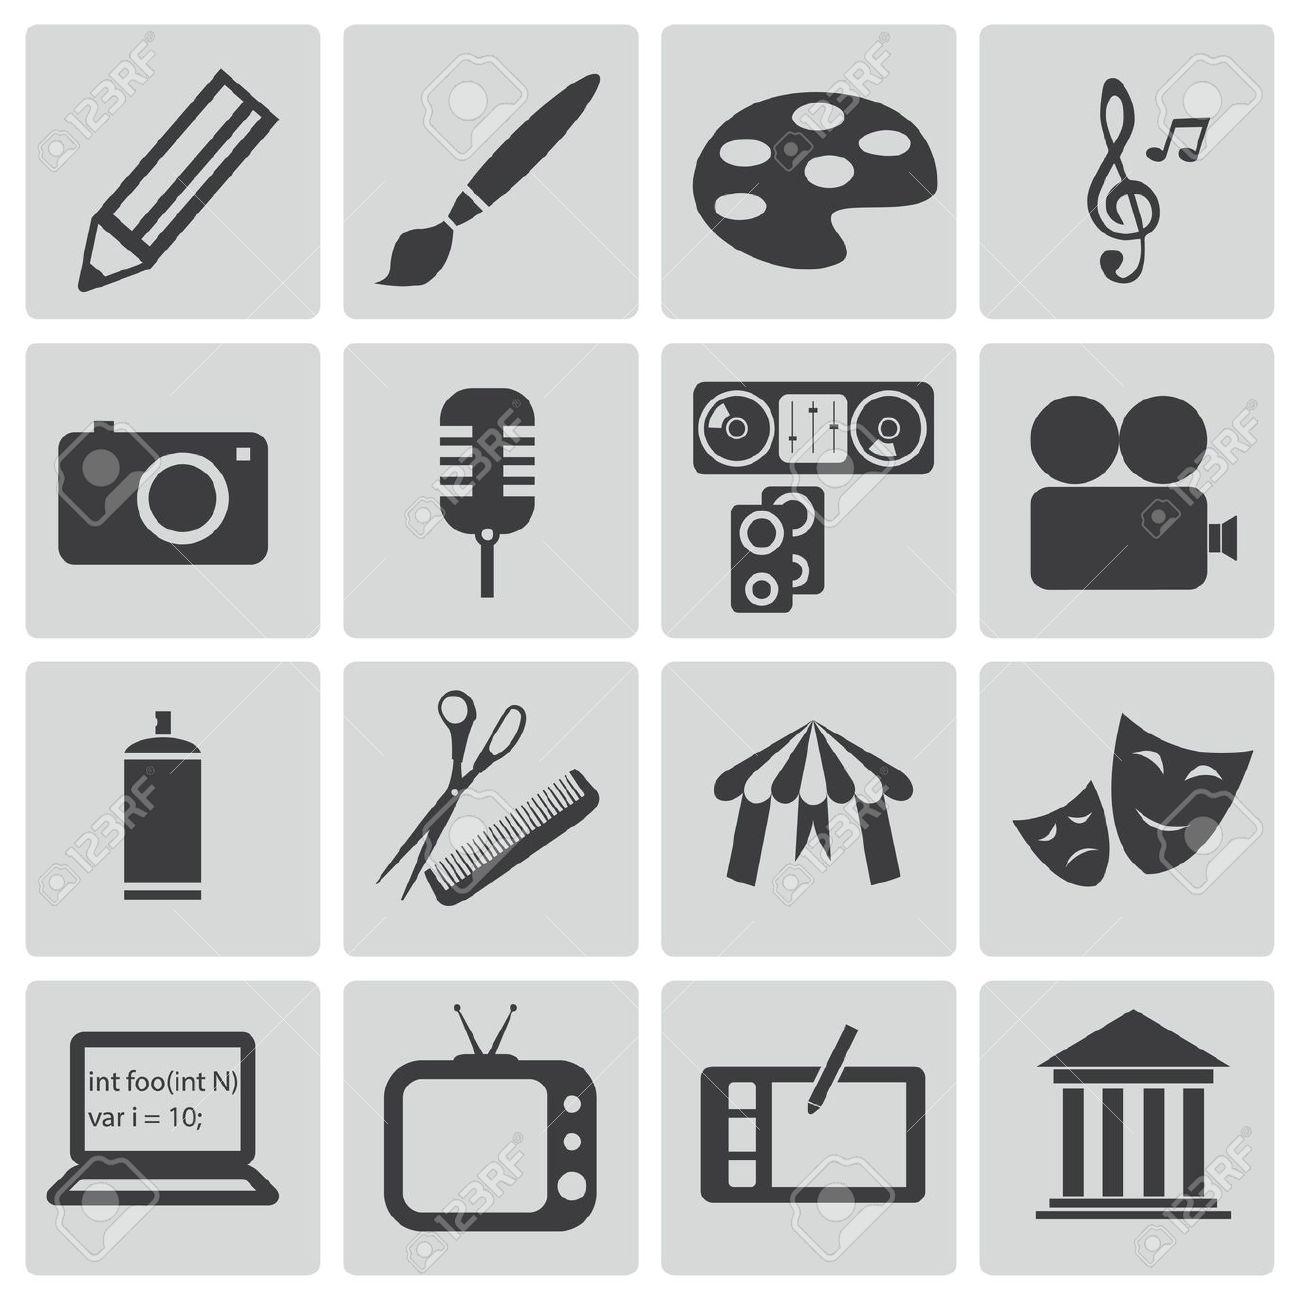 Clipart icon vector.